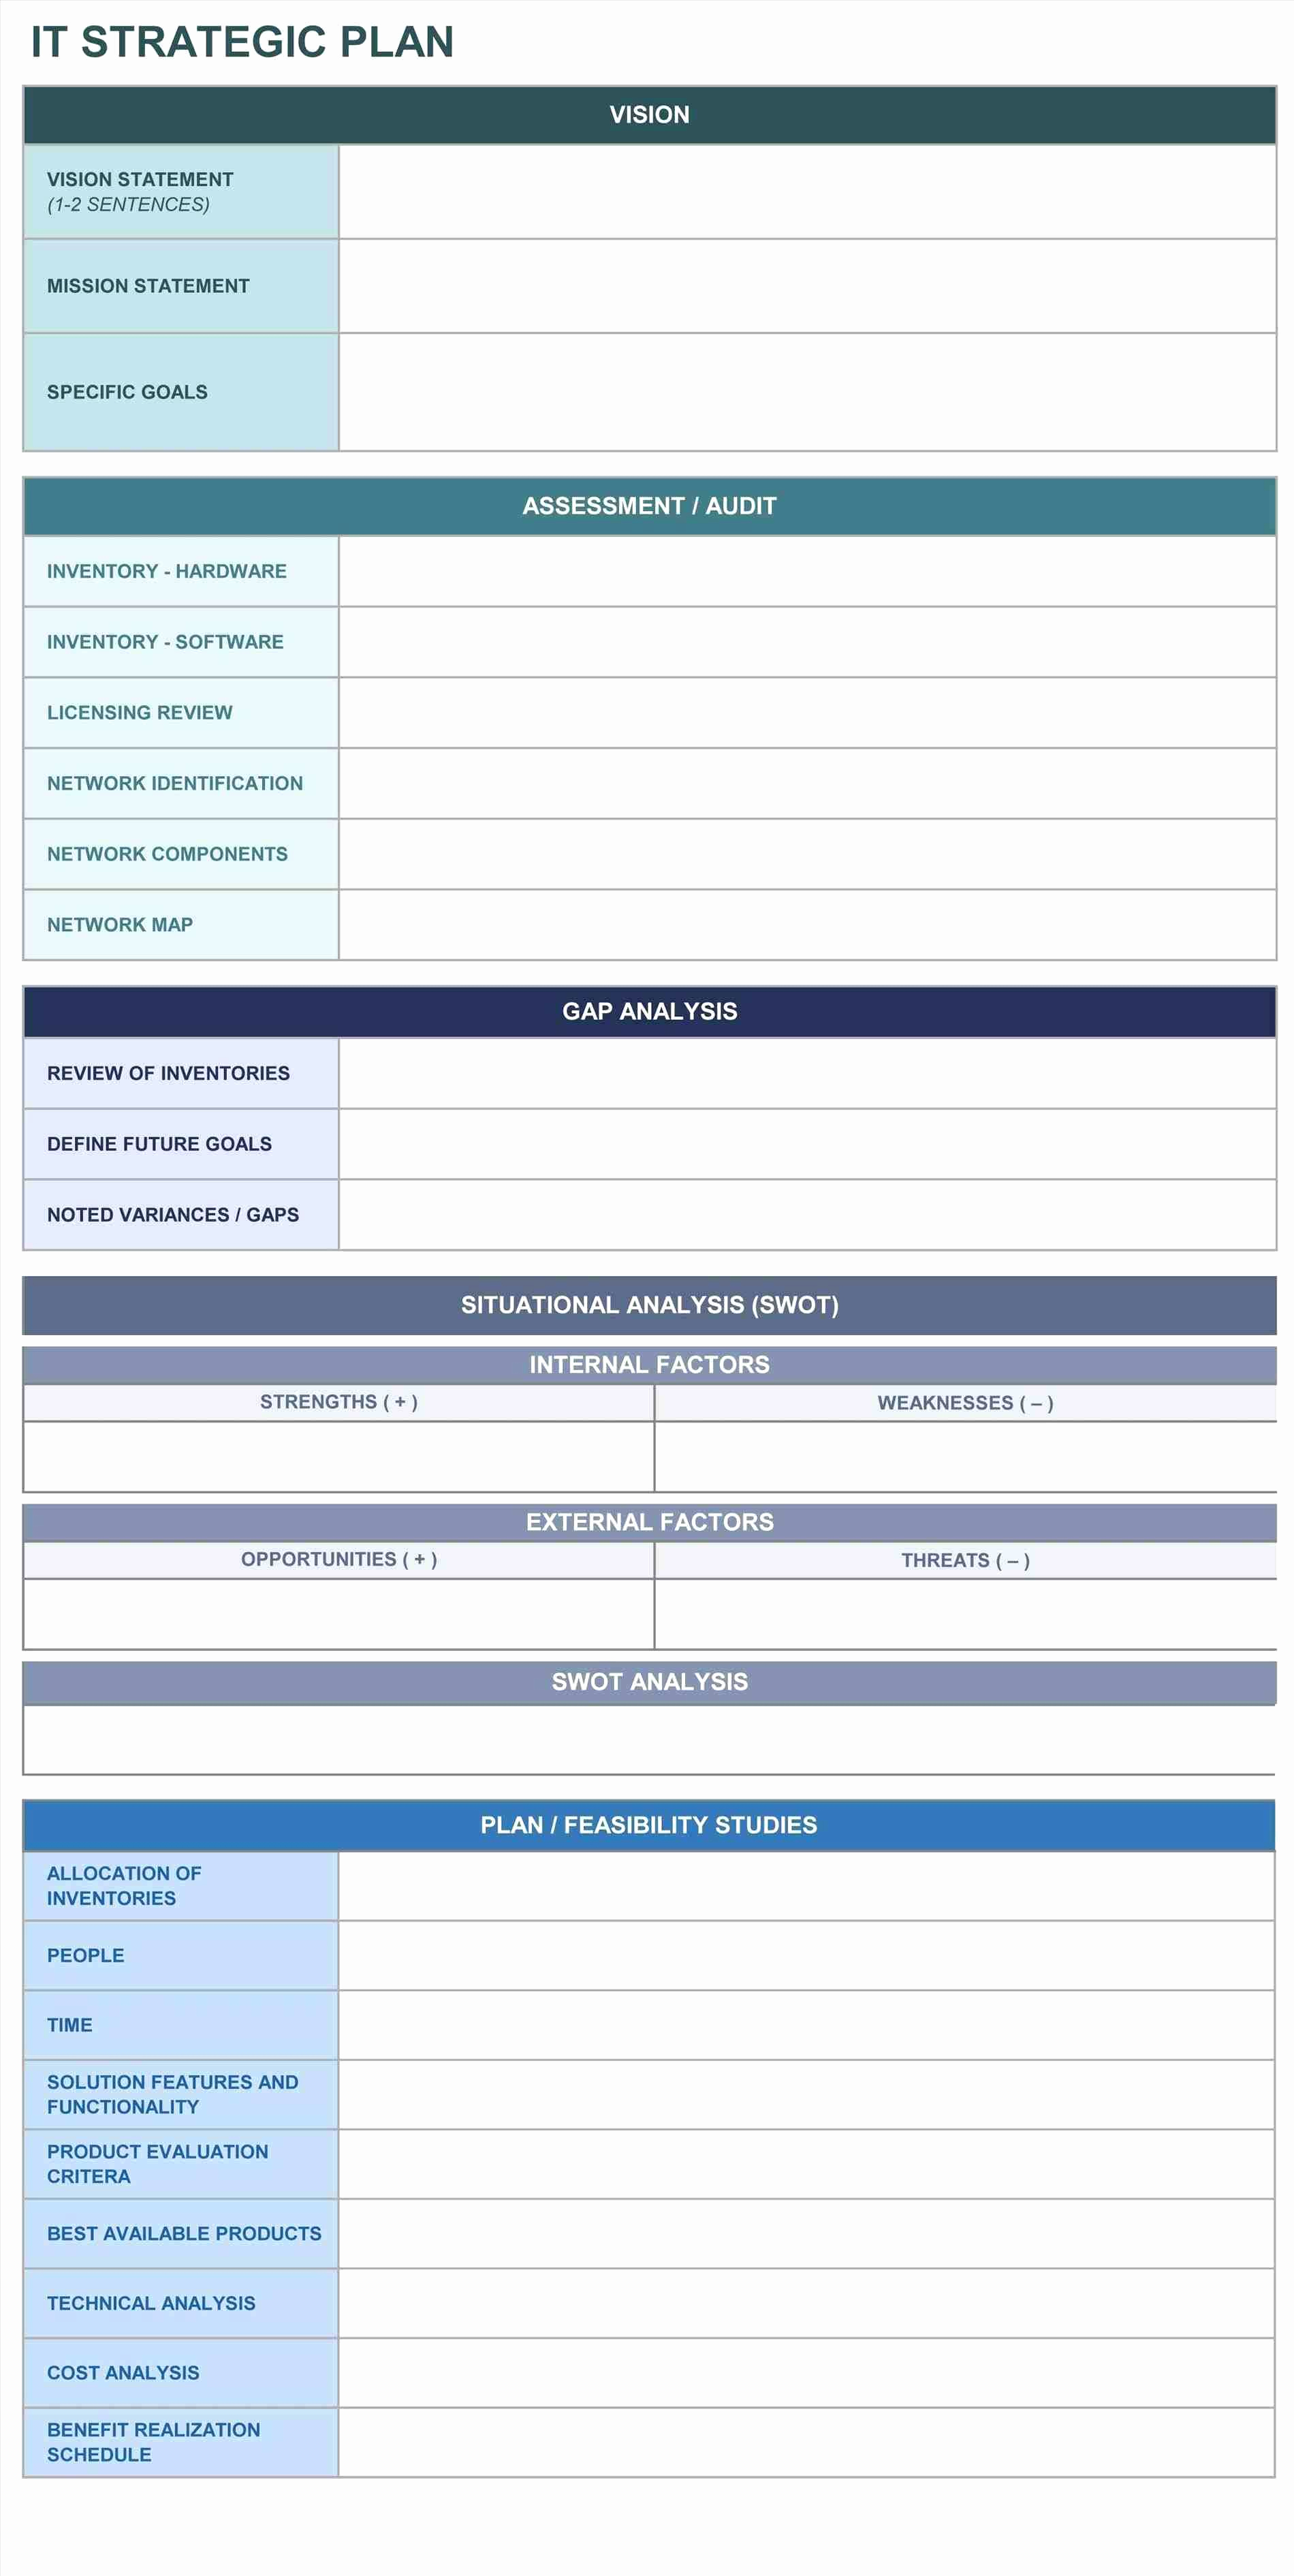 Example Of Dataer Inventory Spreadsheet For Luxury Sample Hr Audit For Data Center Inventory Spreadsheet